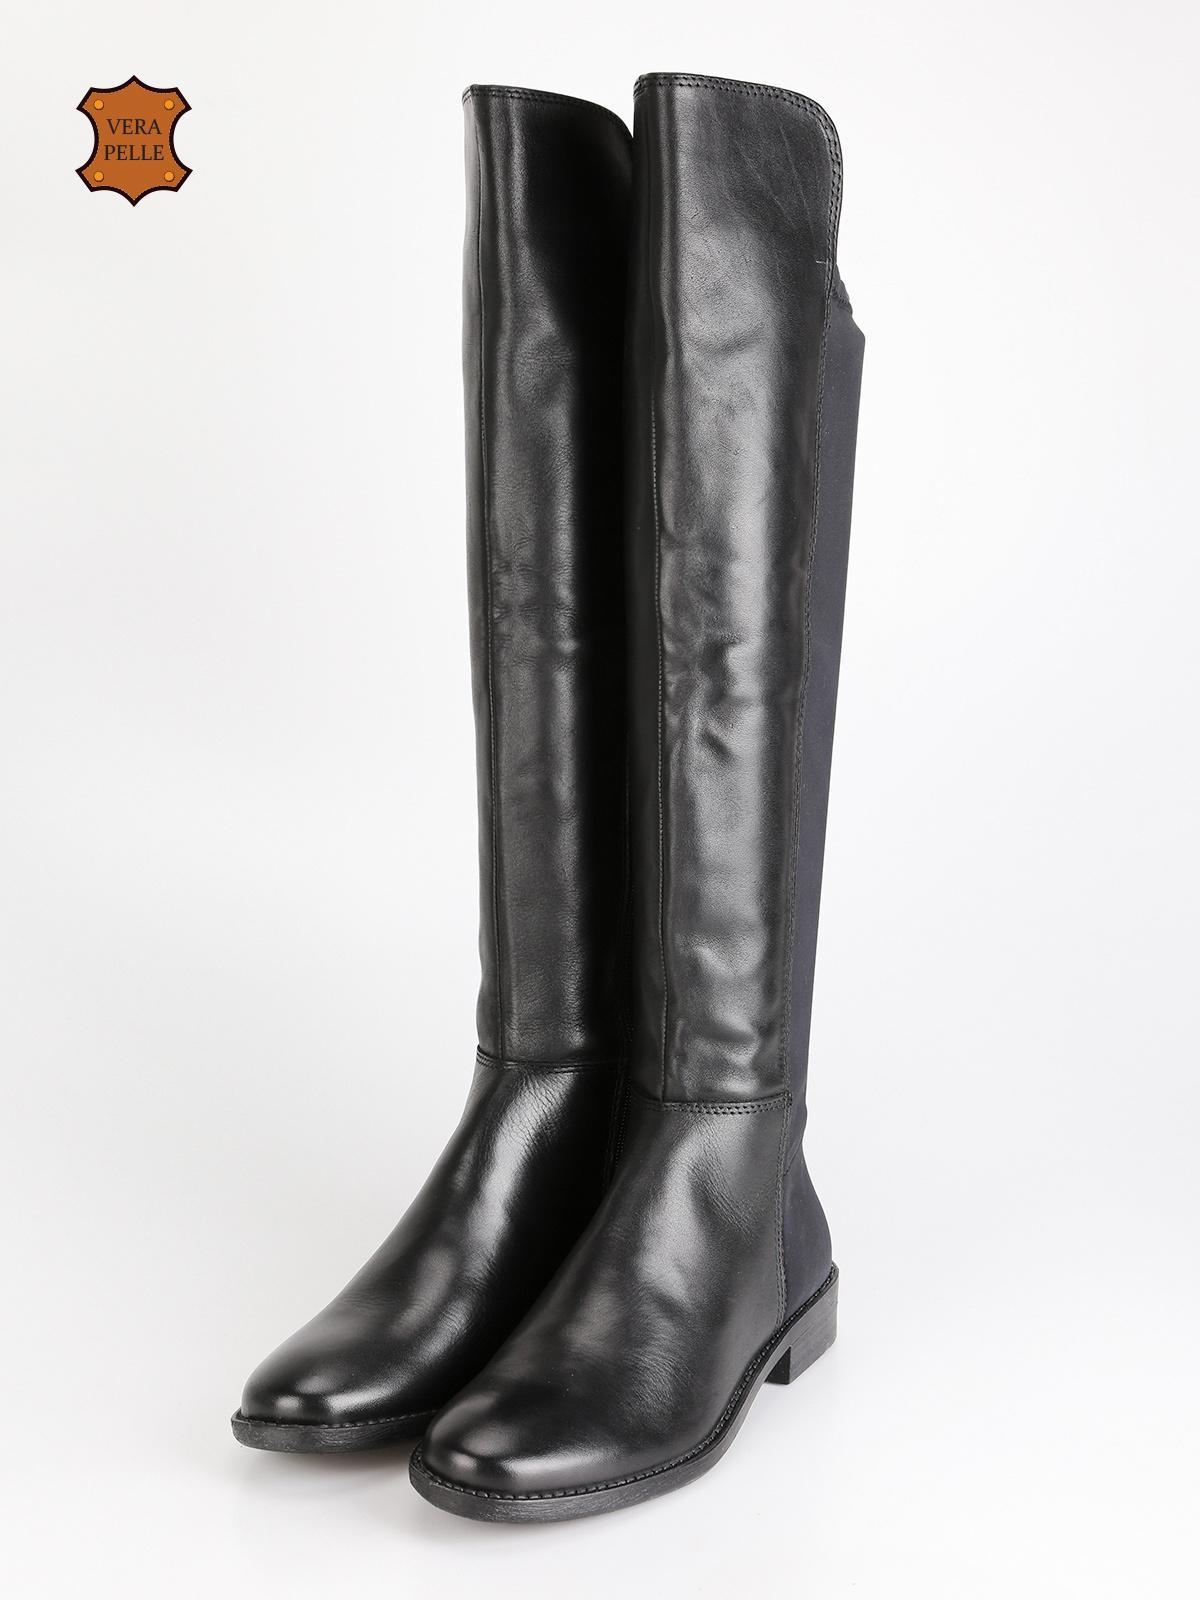 Stivali alti in pelle e tessuto franco bruni | MecShopping